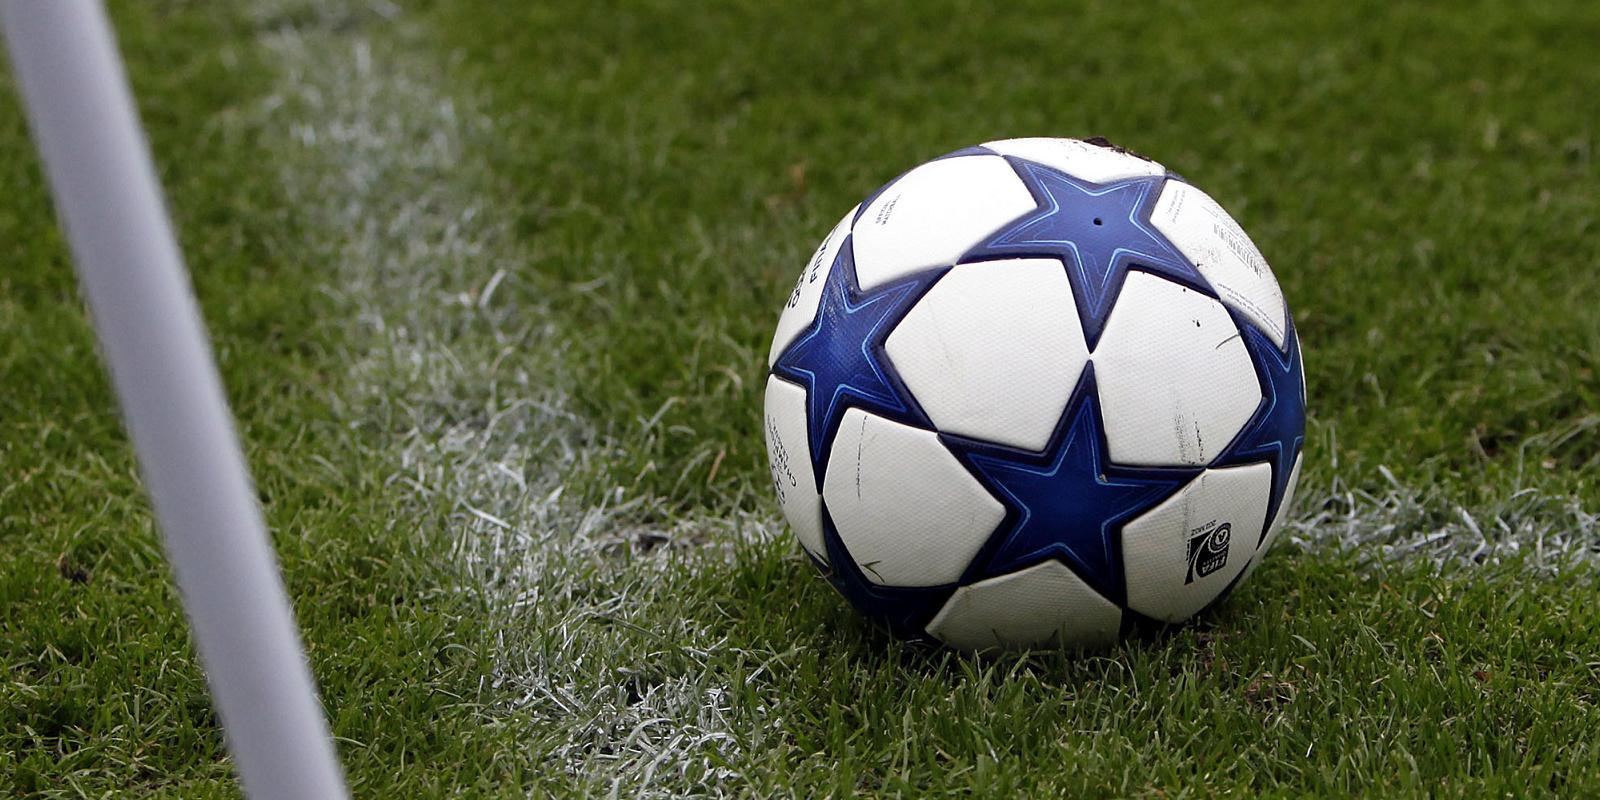 Spaanse club UD Salamanca failliet